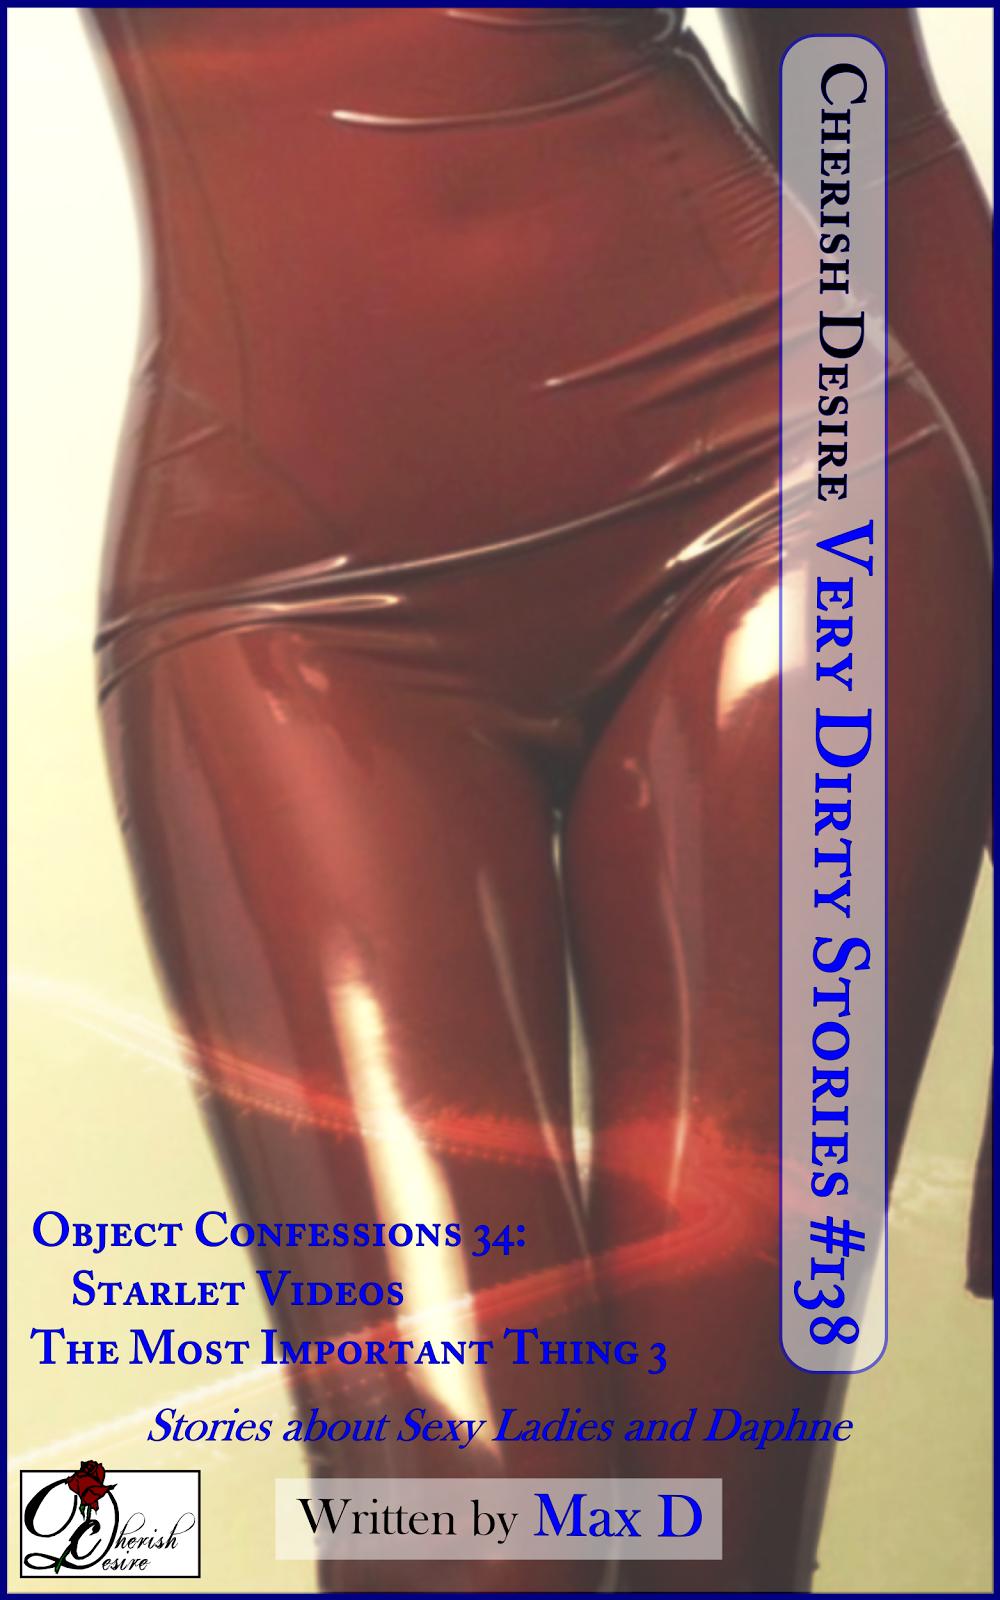 Cherish Desire: Very Dirty Stories #138, Max D, erotica